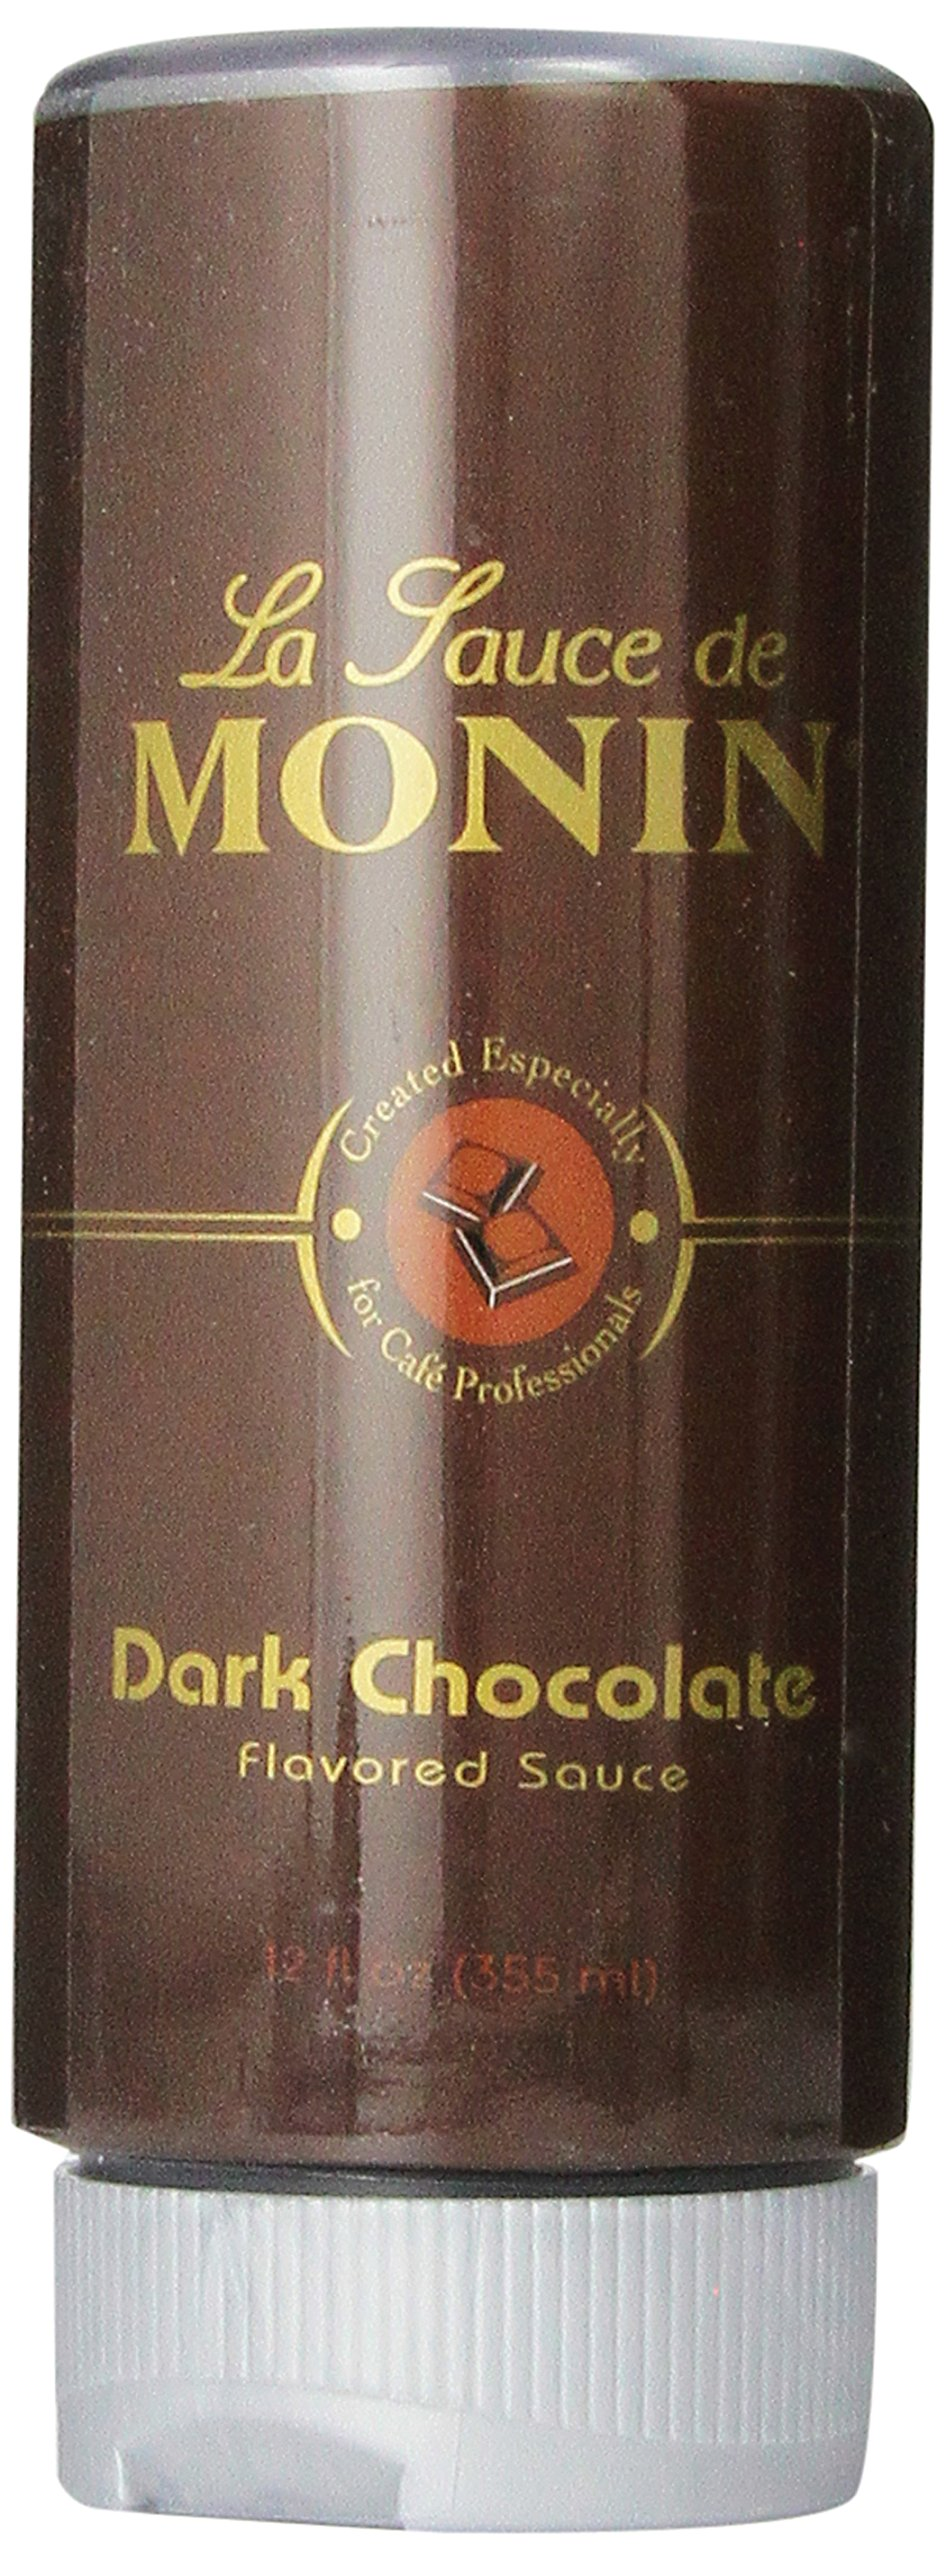 Monin Flavored Sauce, Dark Chocolate, 12-Ounce Bottles (Pack of 6)